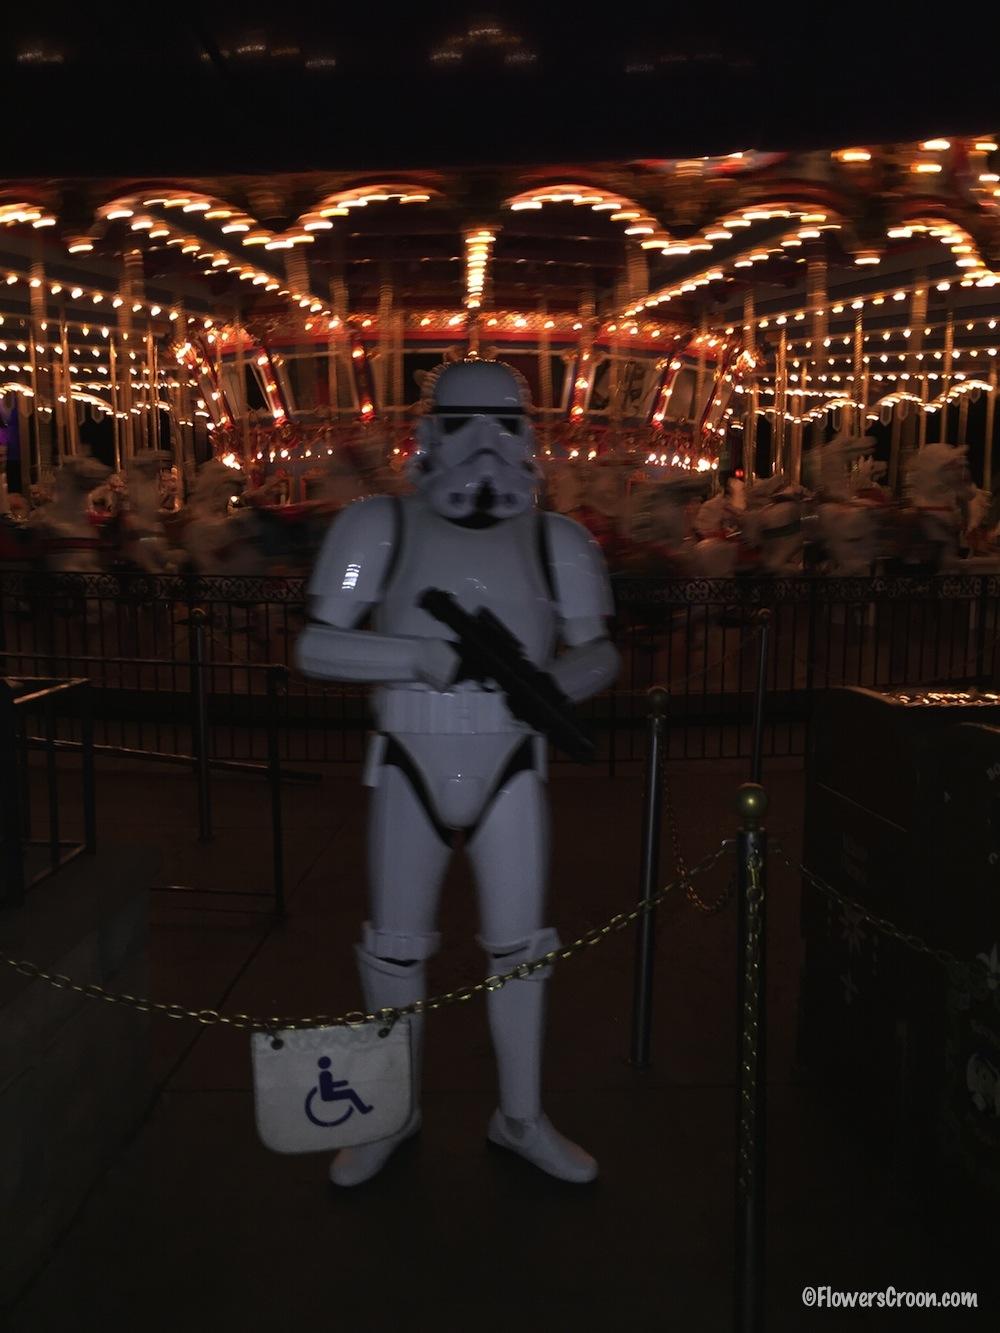 stormtrooper-carousel-fantasyland.jpg